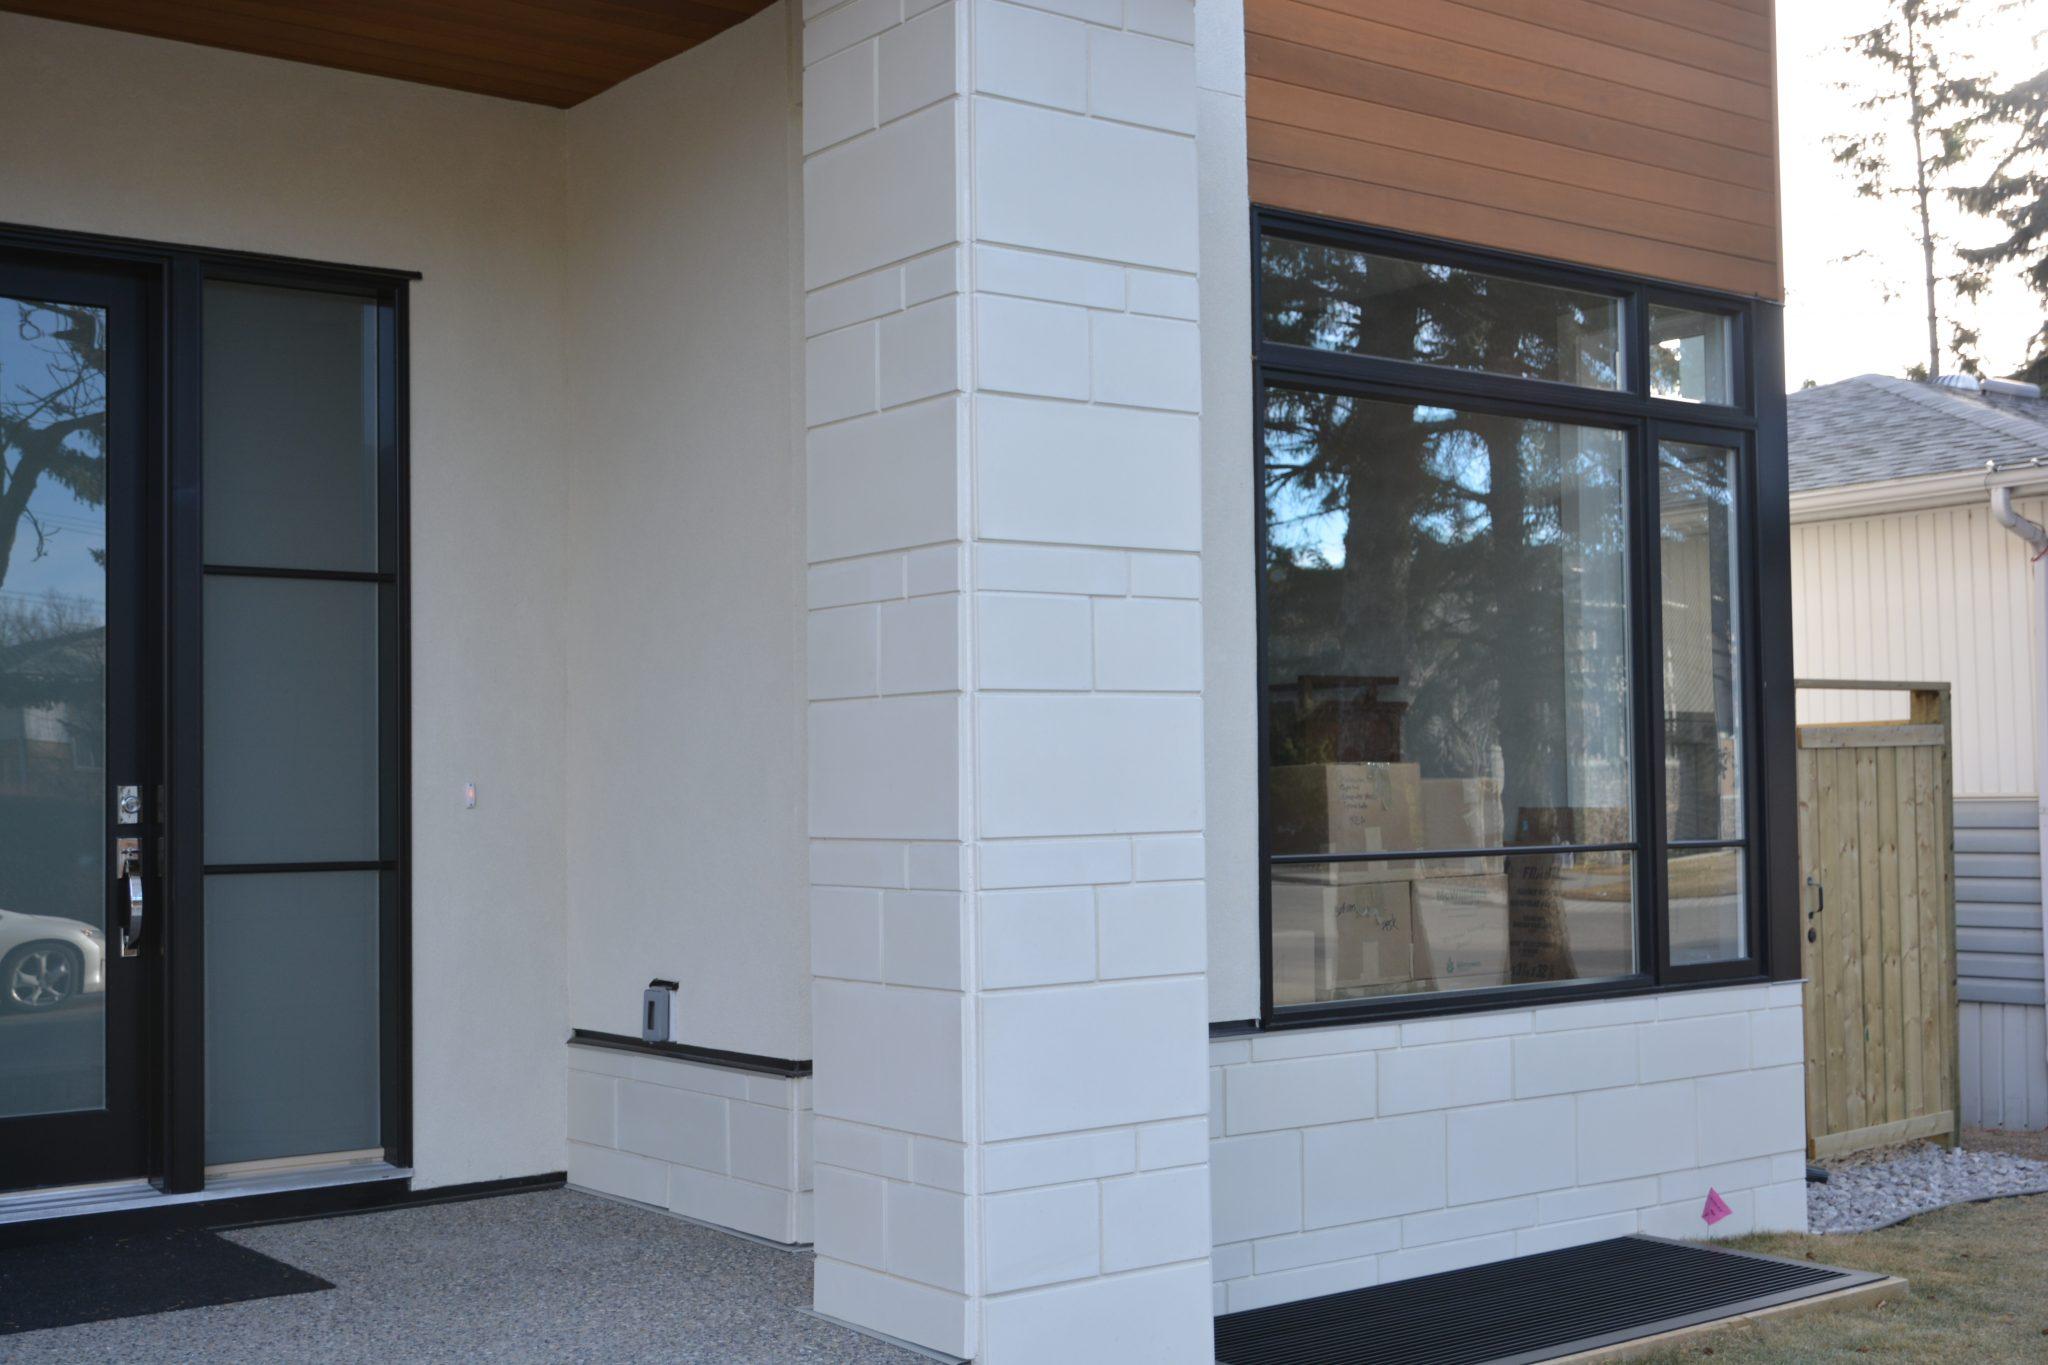 Ledge Tiles - Stonetile Canada